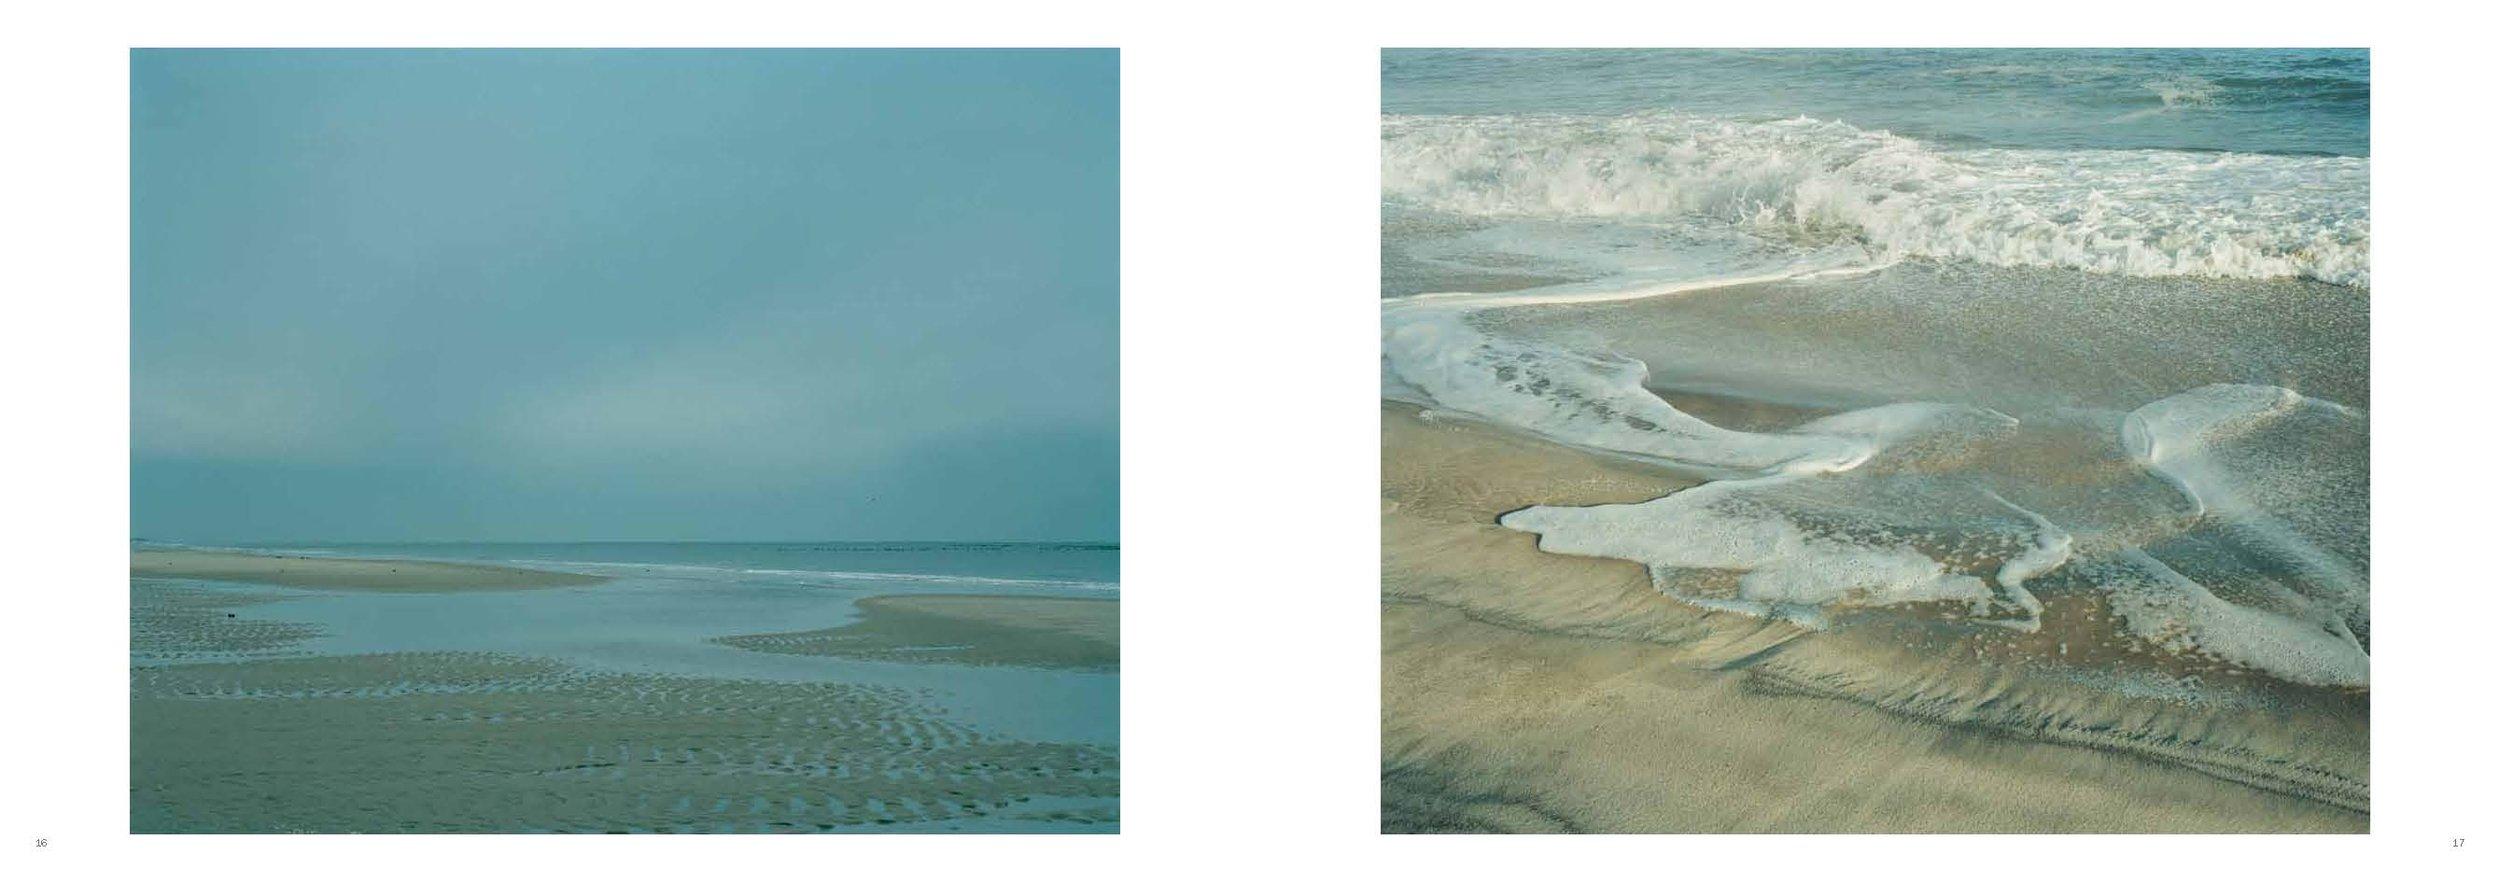 Sand_Sea_Sky_09.jpg